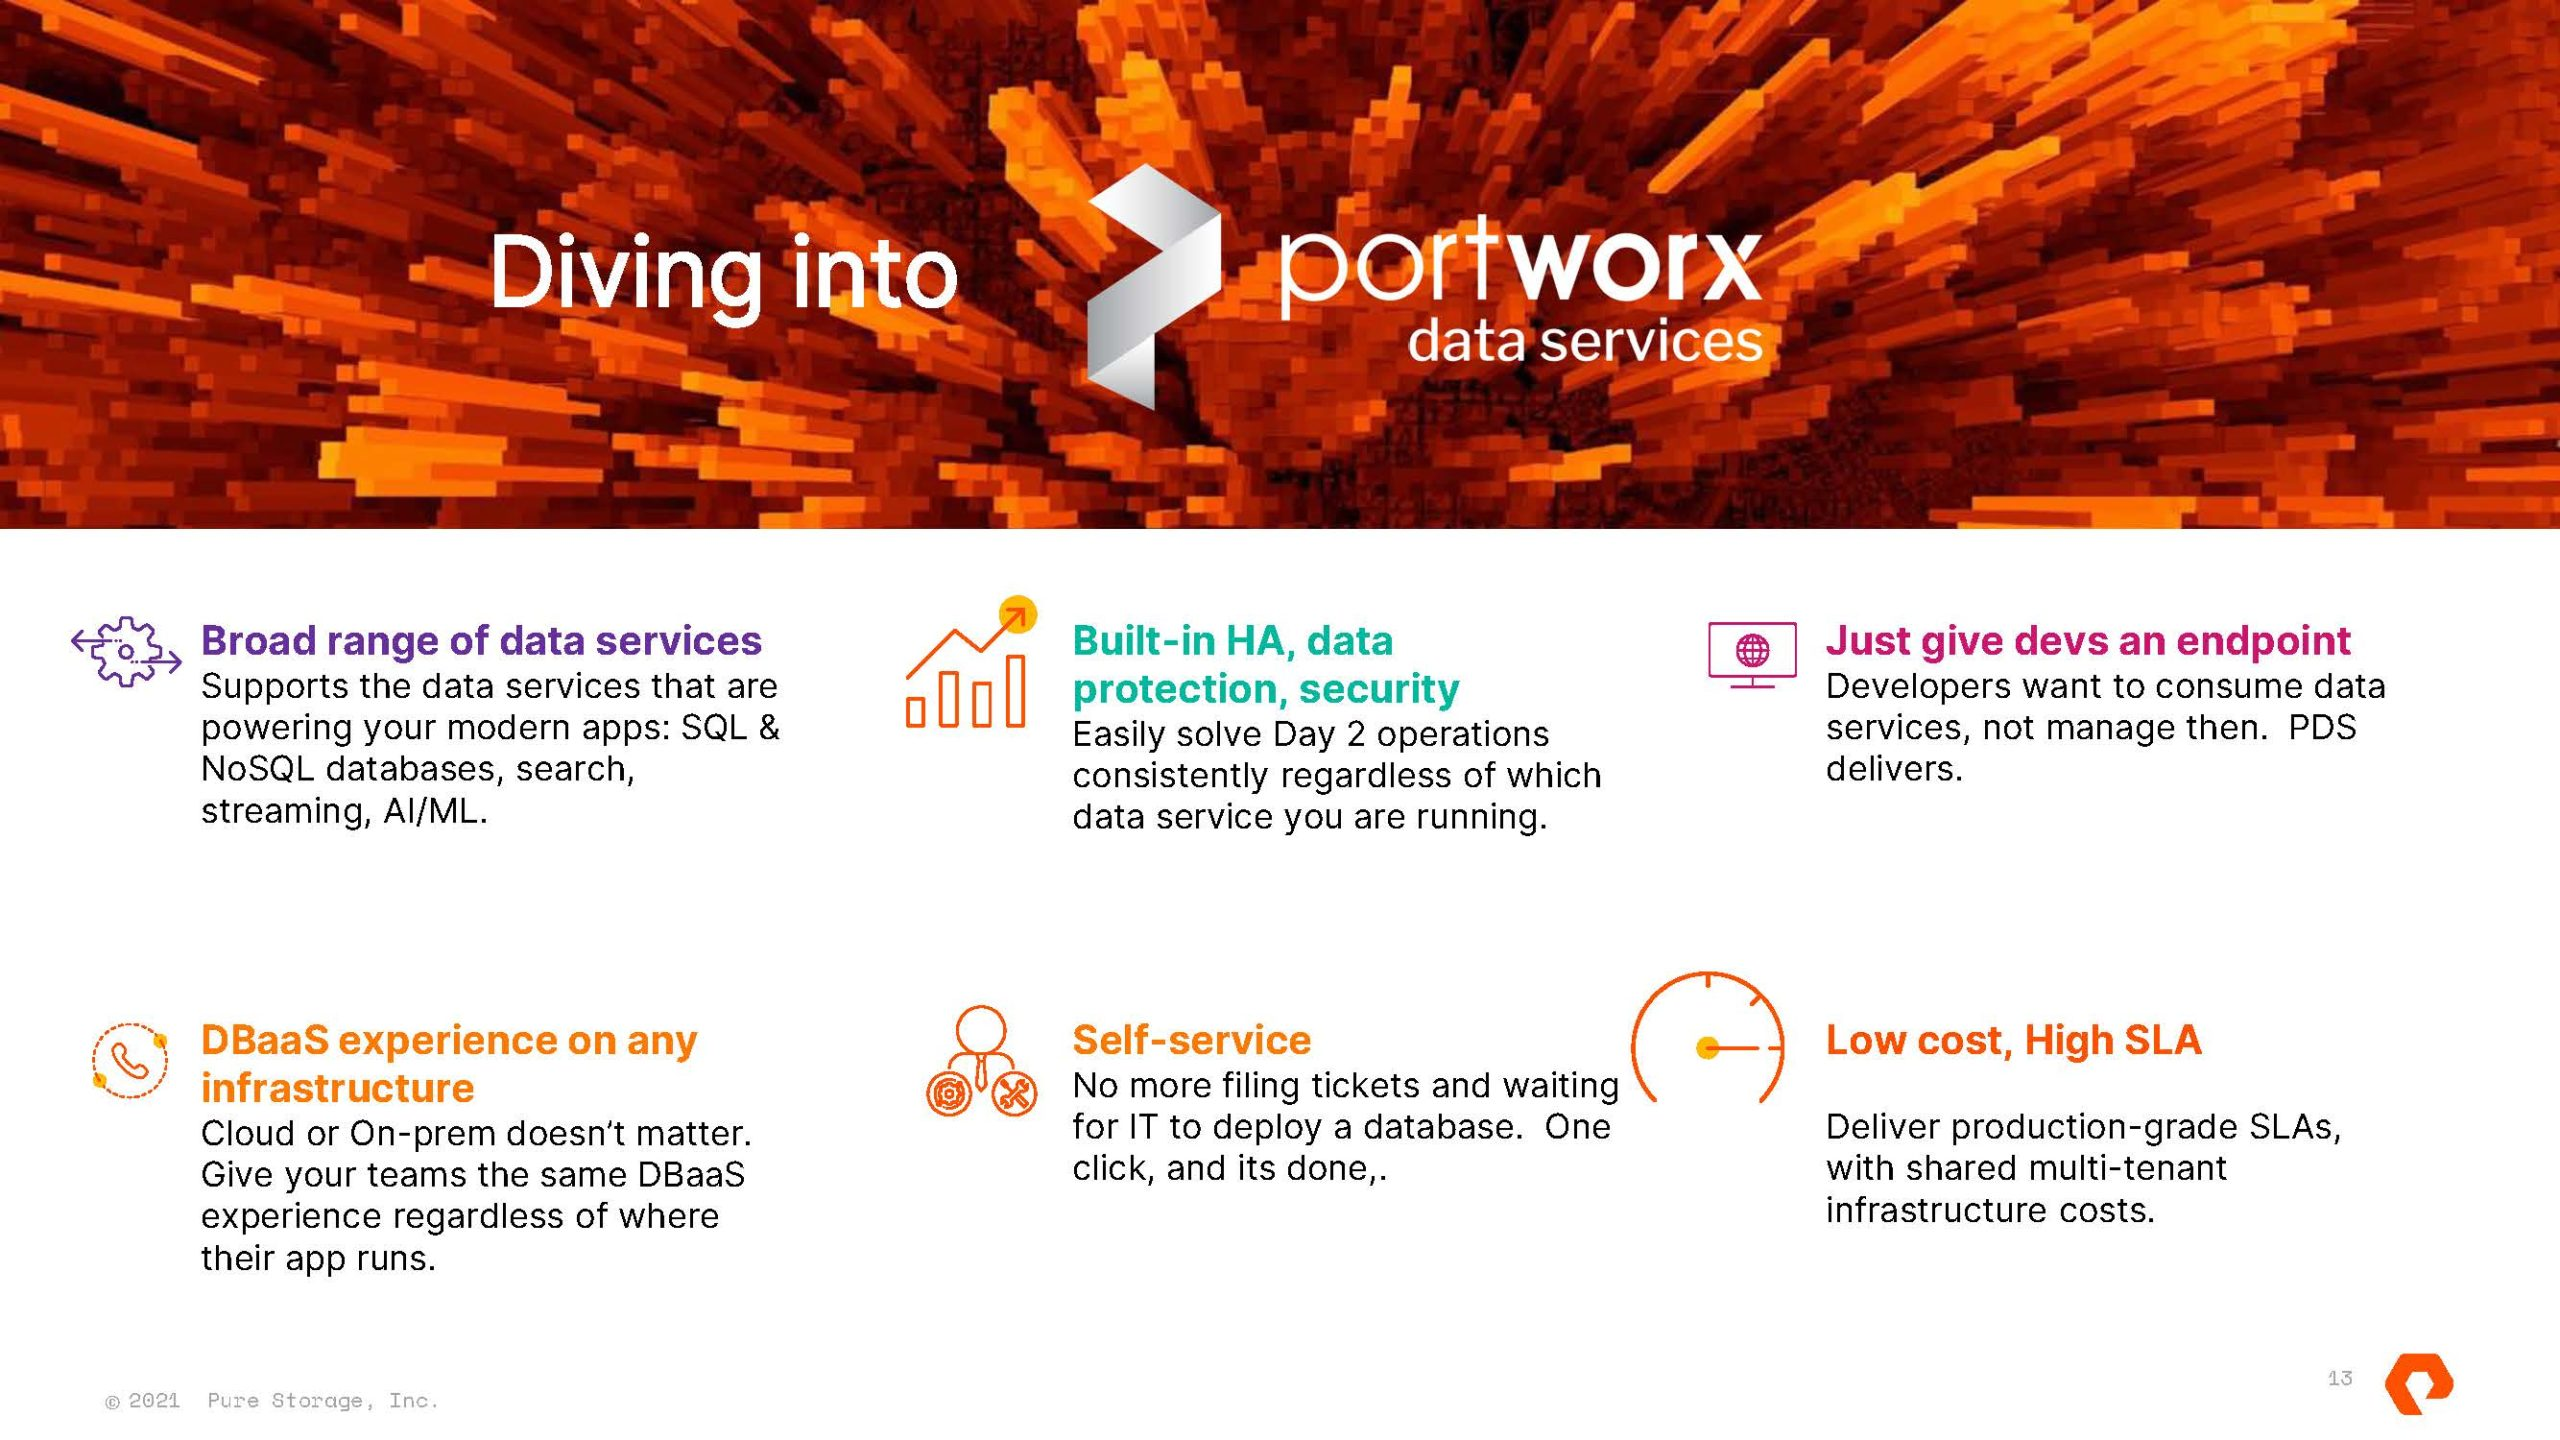 Pure Storage Portworx Data Services Dive